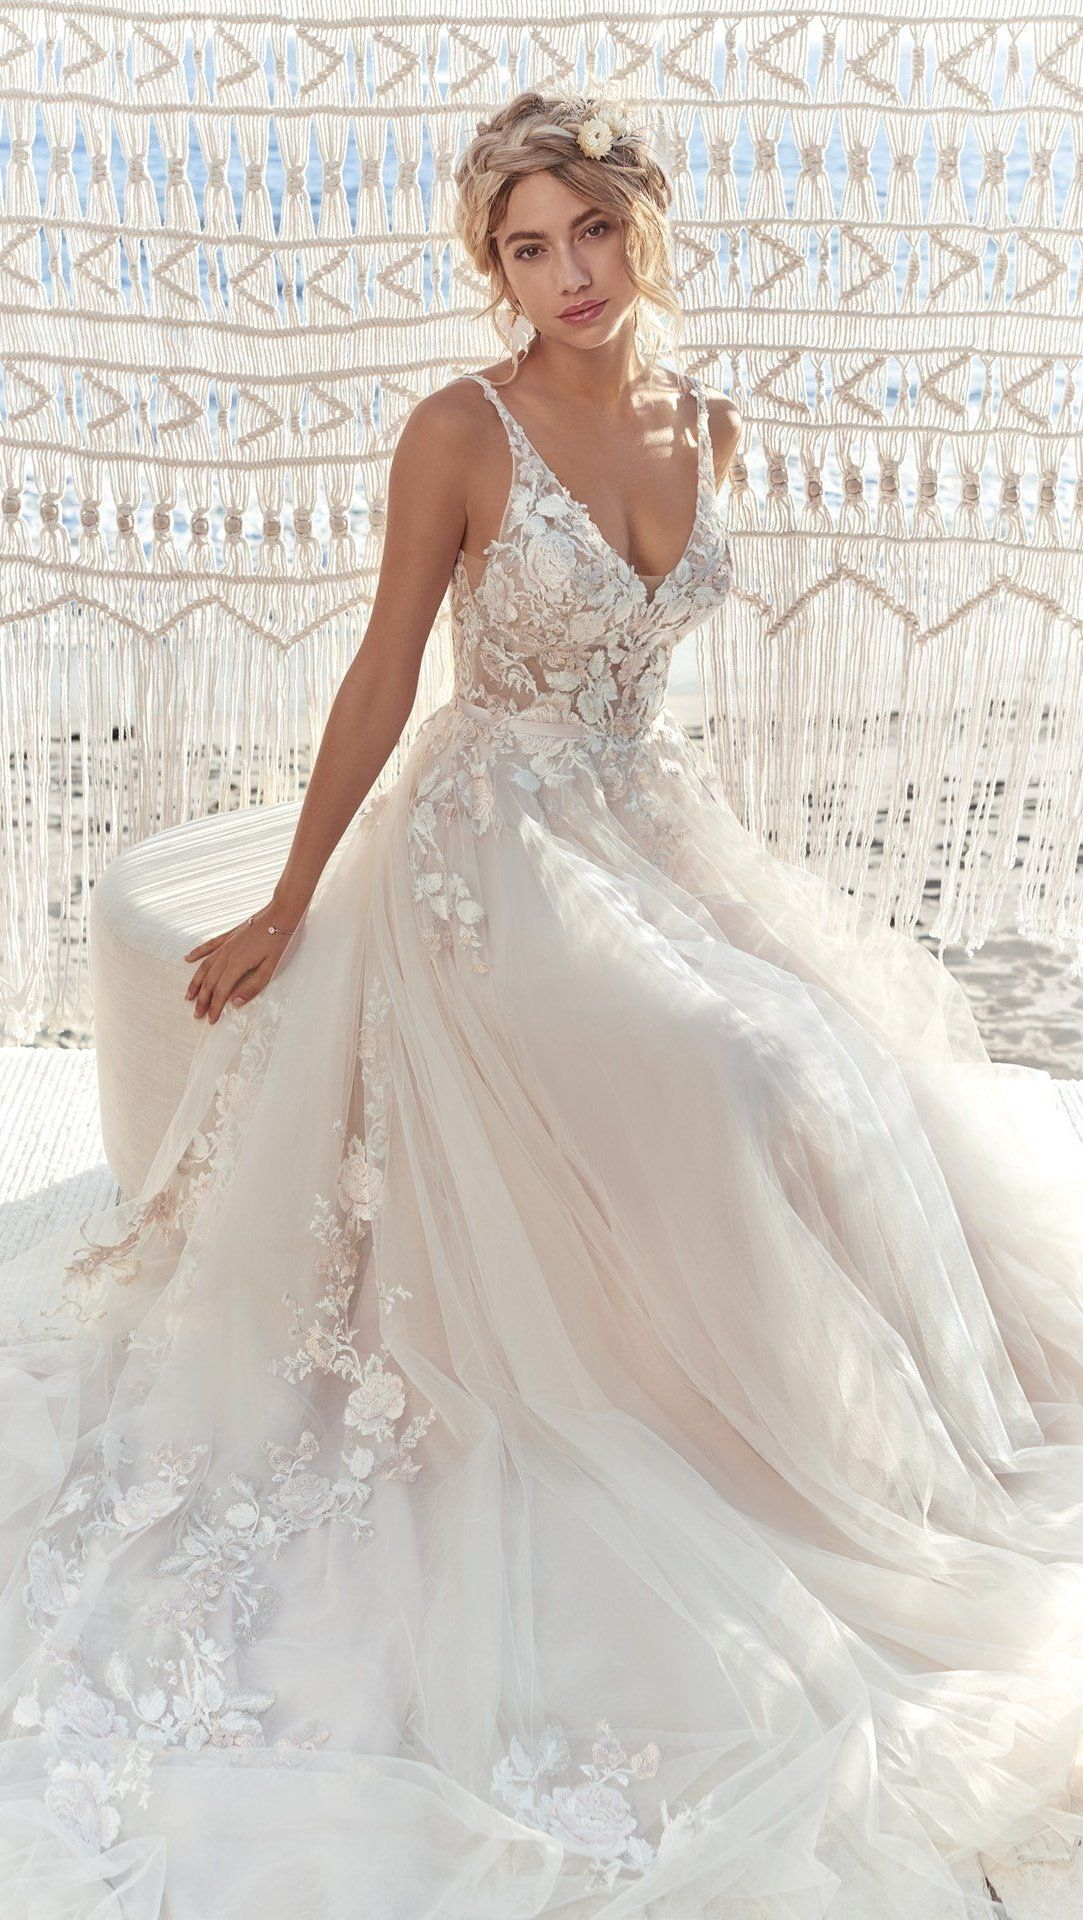 Minerva By Rebecca Ingram Wedding Dresses And Accessories Ball Gowns Wedding Sottero Wedding Dress Dream Wedding Dresses [ 1920 x 1083 Pixel ]